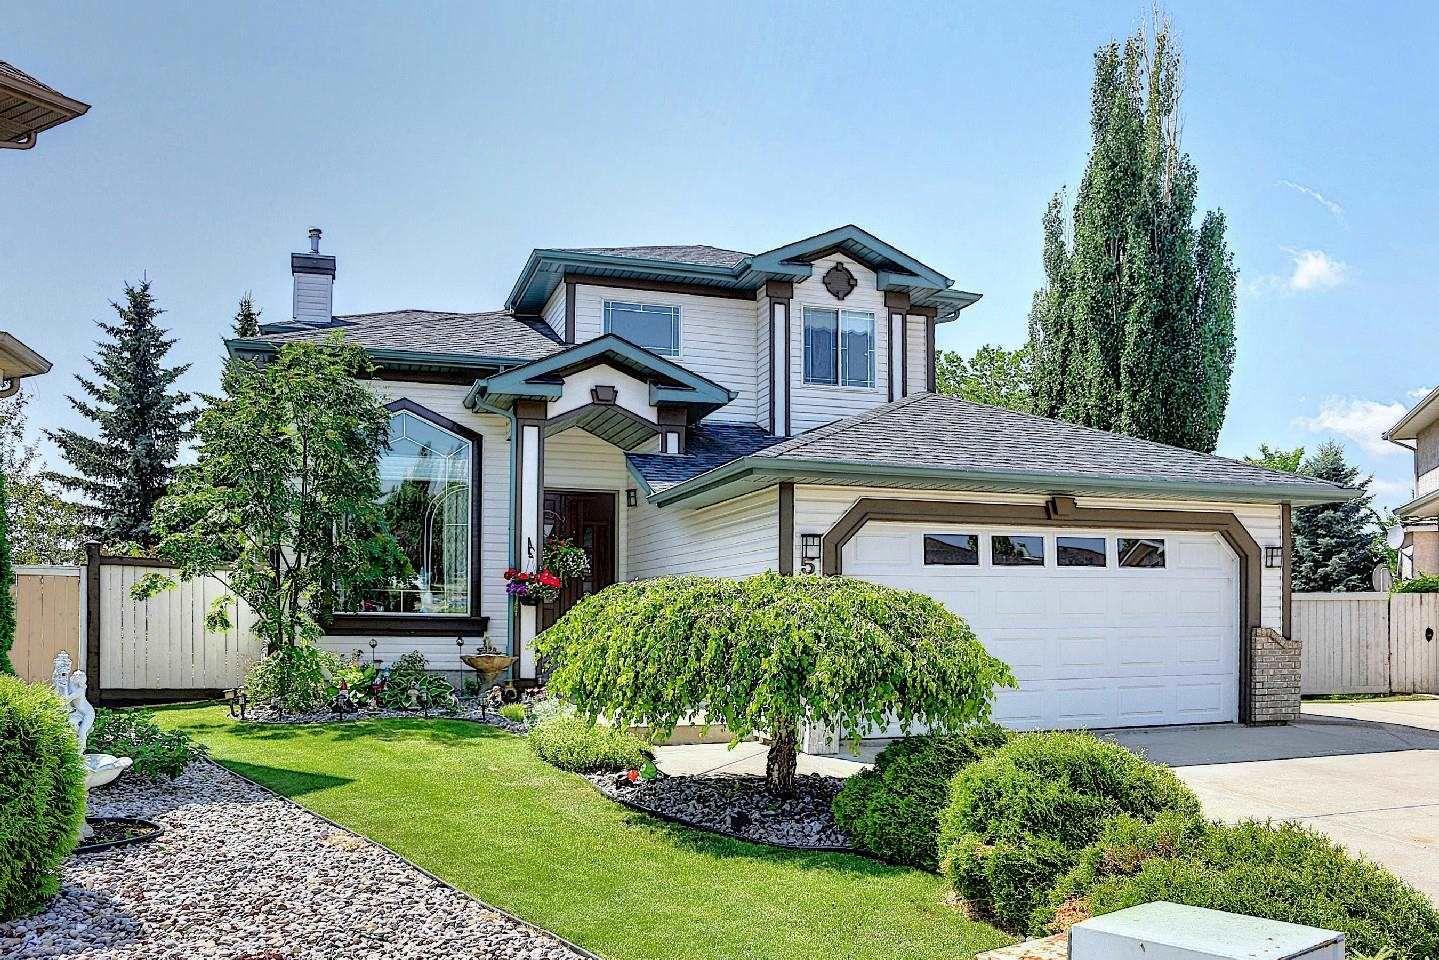 Main Photo: 522 REID Close in Edmonton: Zone 14 House for sale : MLS®# E4253412